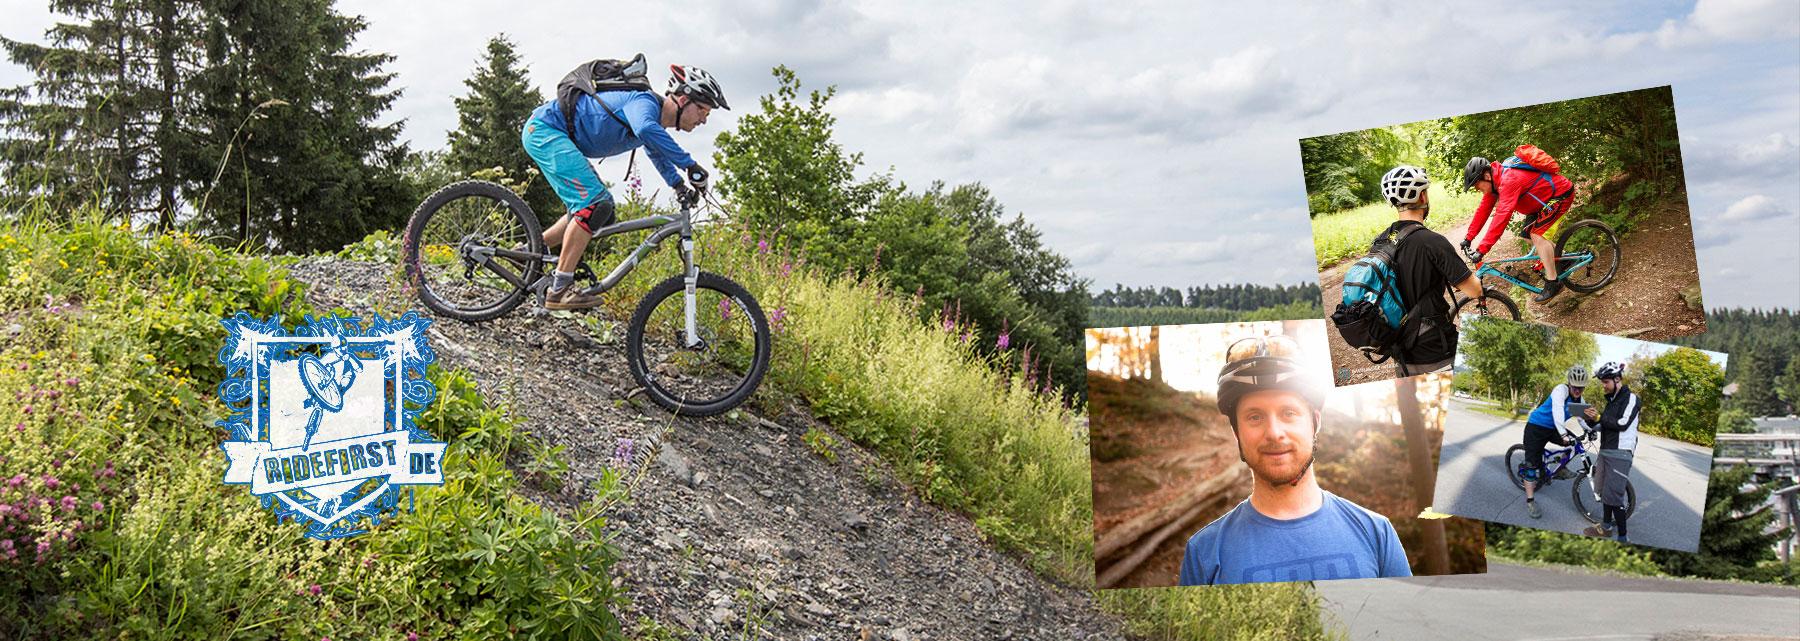 Marc Brodesser - Fahrradtechnik Camp